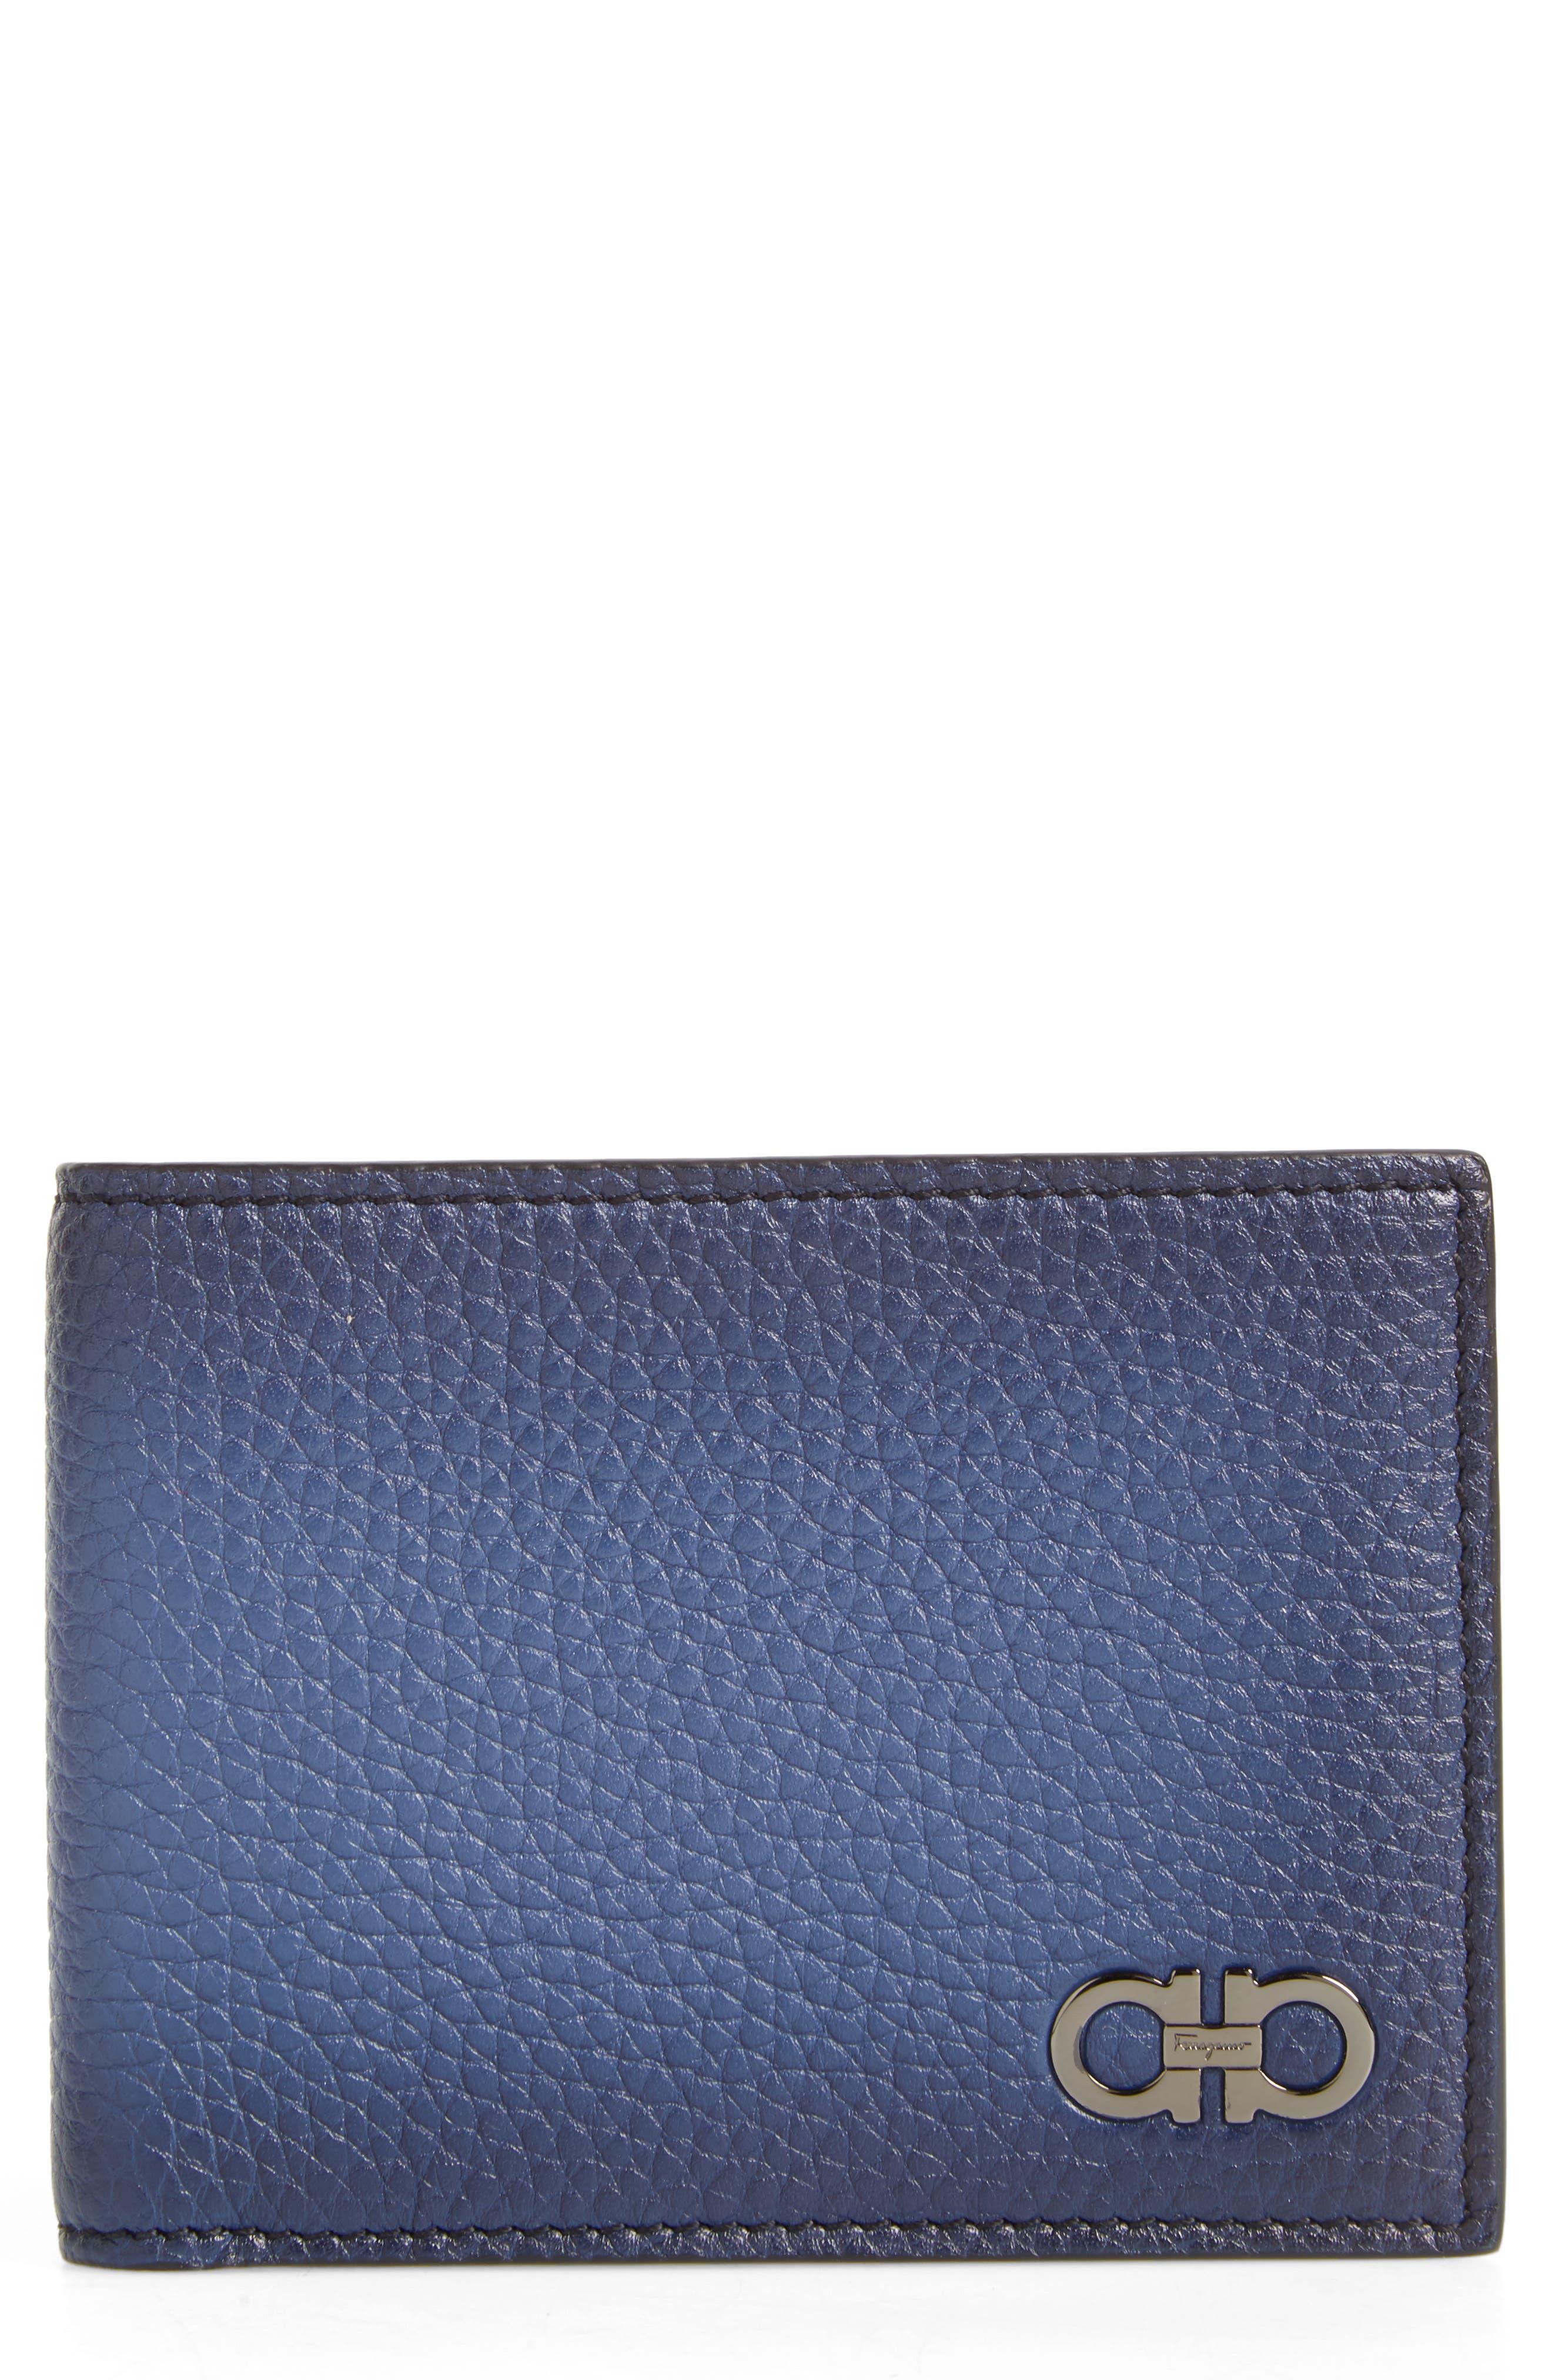 Firenze Glow Calfskin Leather Bifold Wallet,                         Main,                         color,